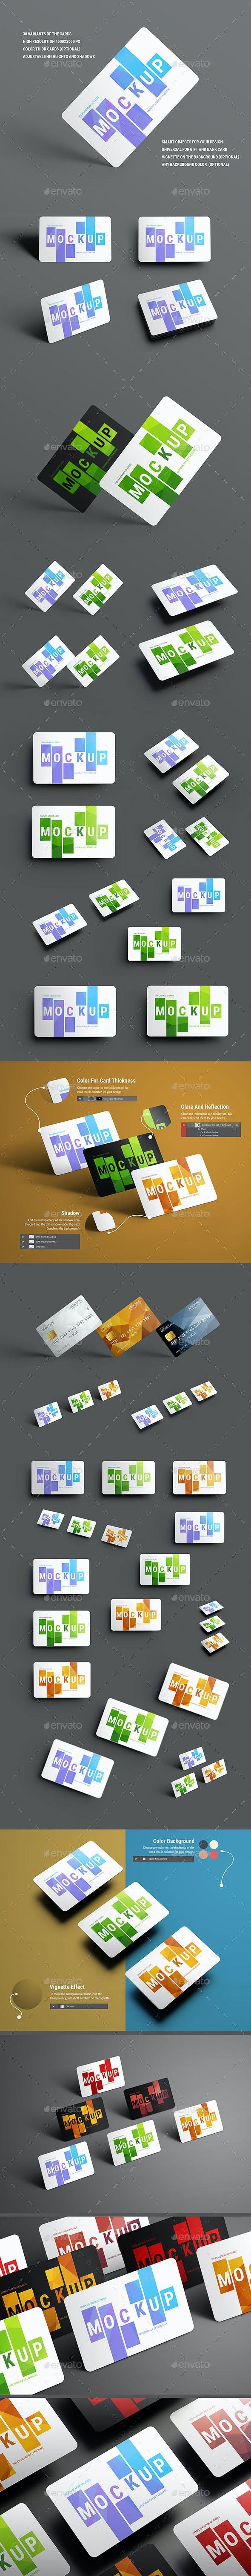 30 Mockups Universal For Gift and Bank Cards - Product Mock-Ups Graphics